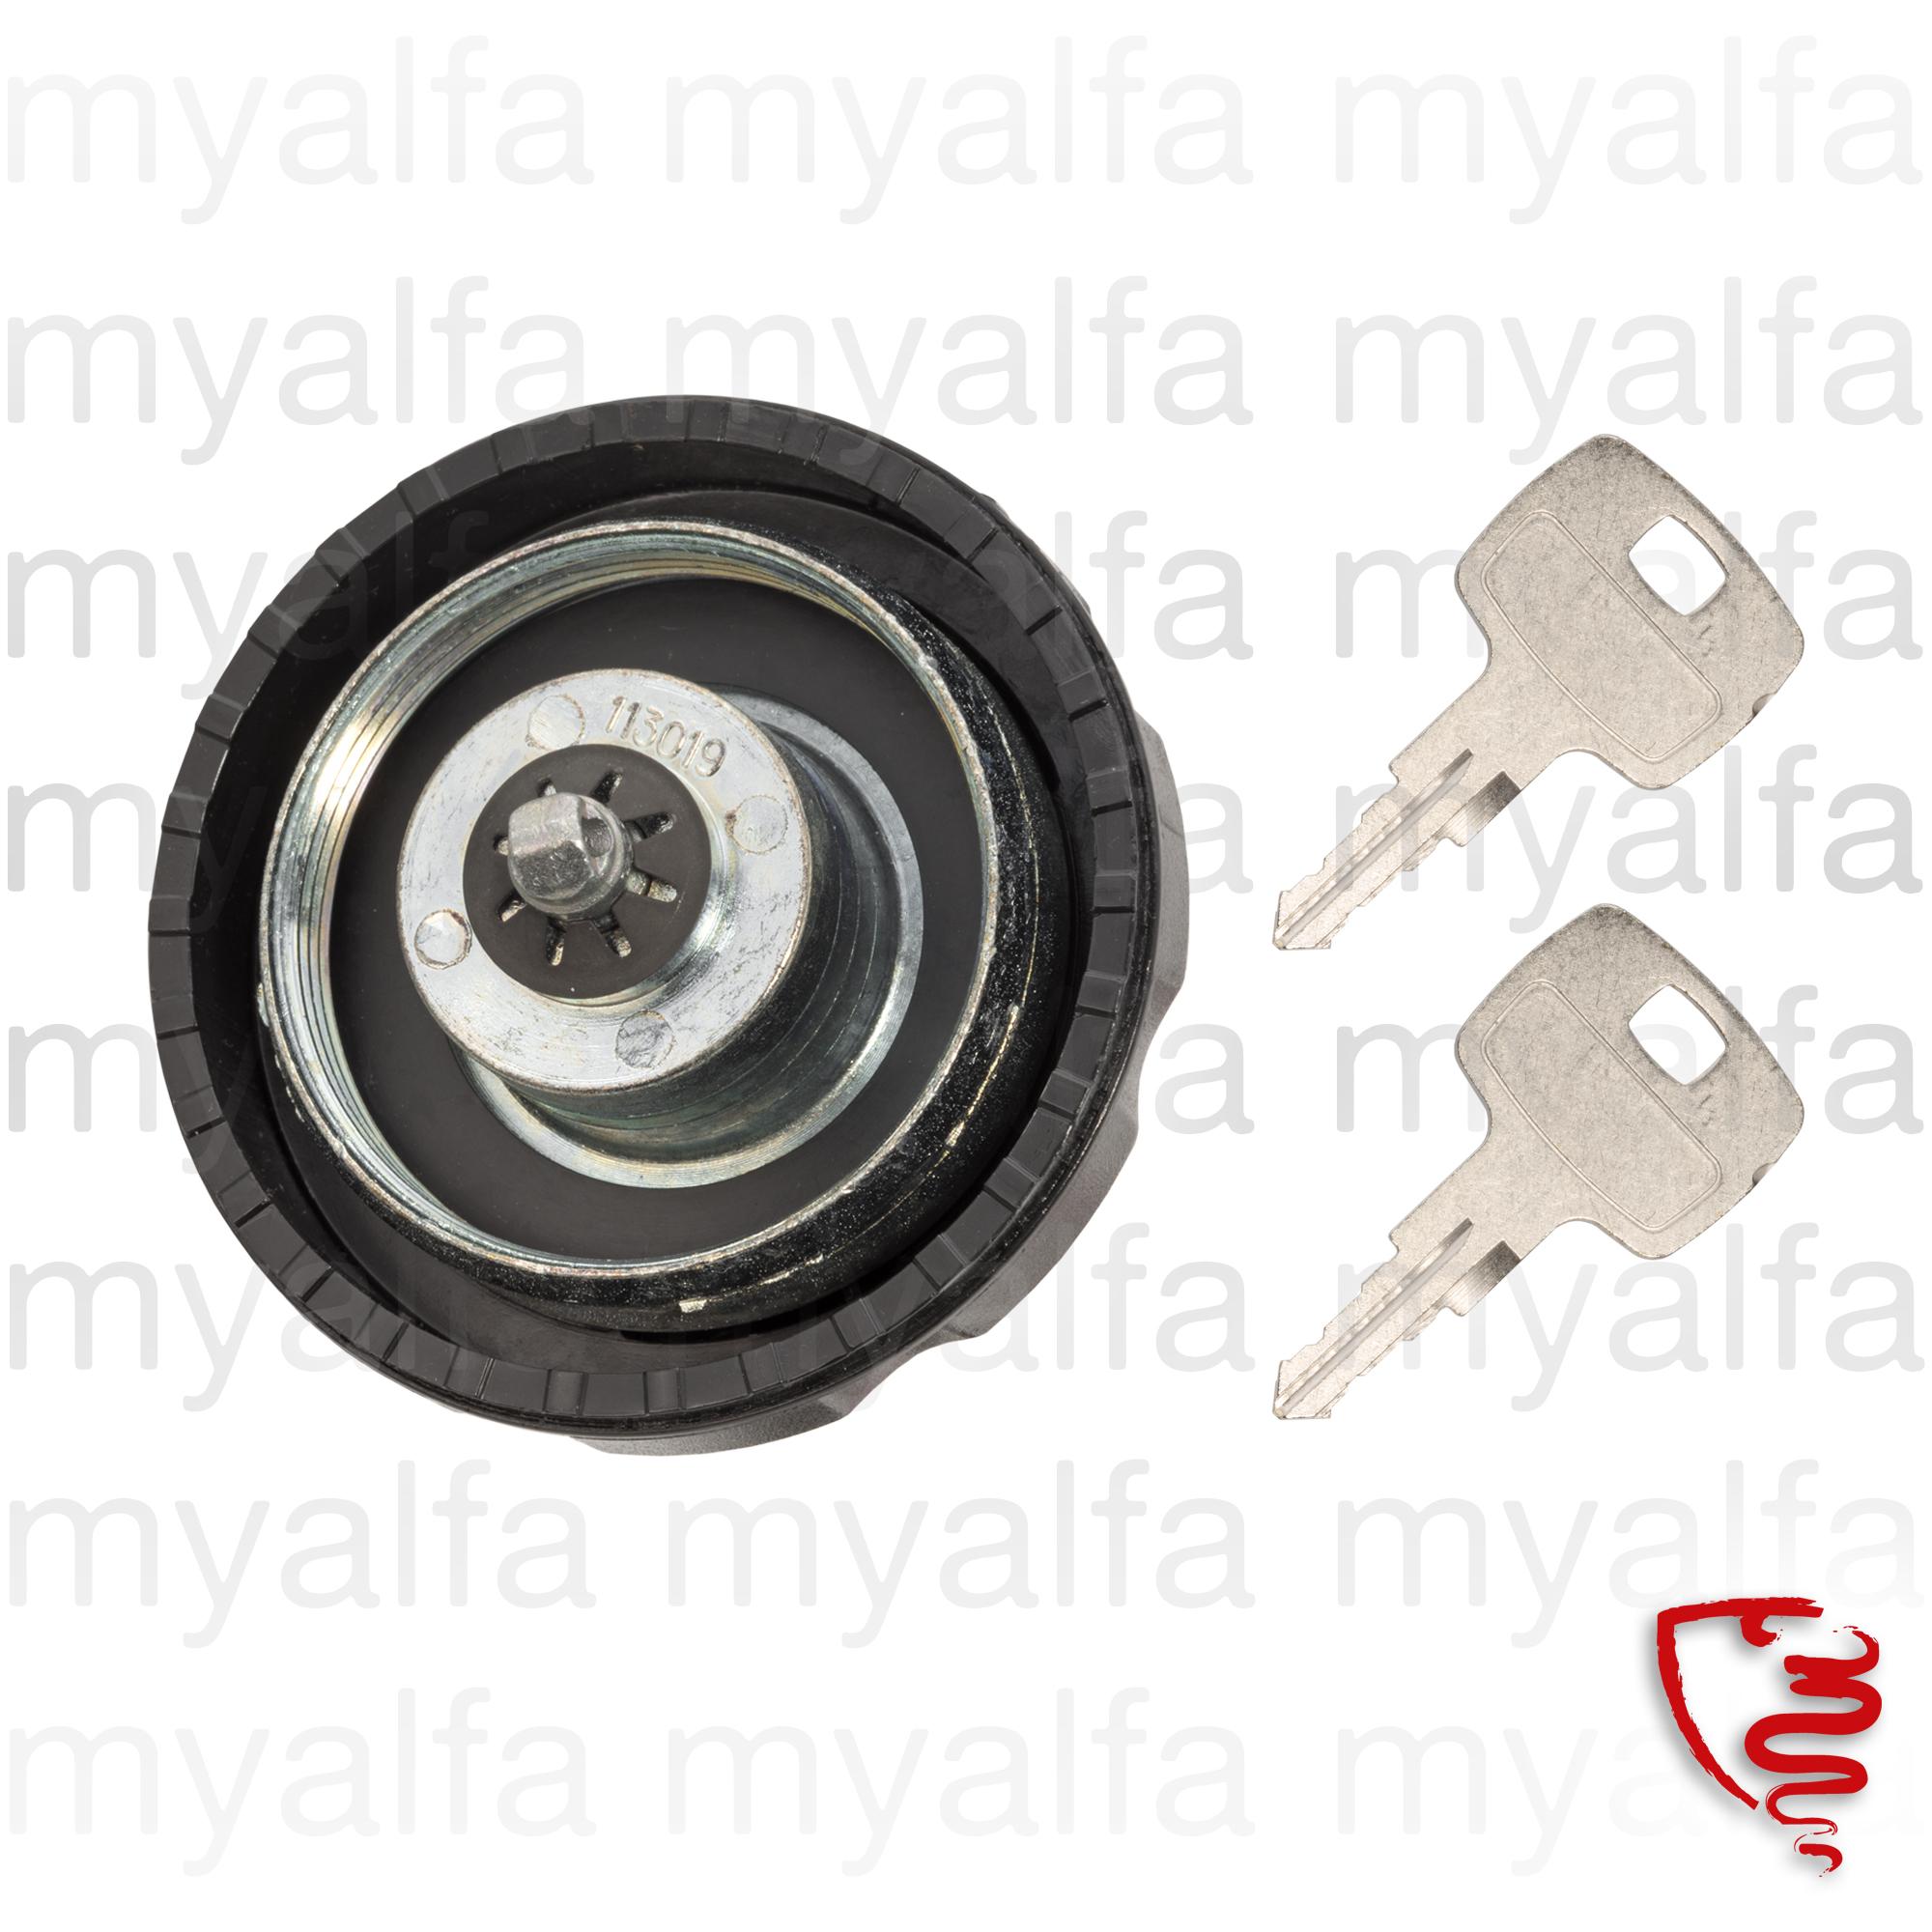 Fuel tank lid - locking screw for 105/115, Fuel system, Fuel Tank